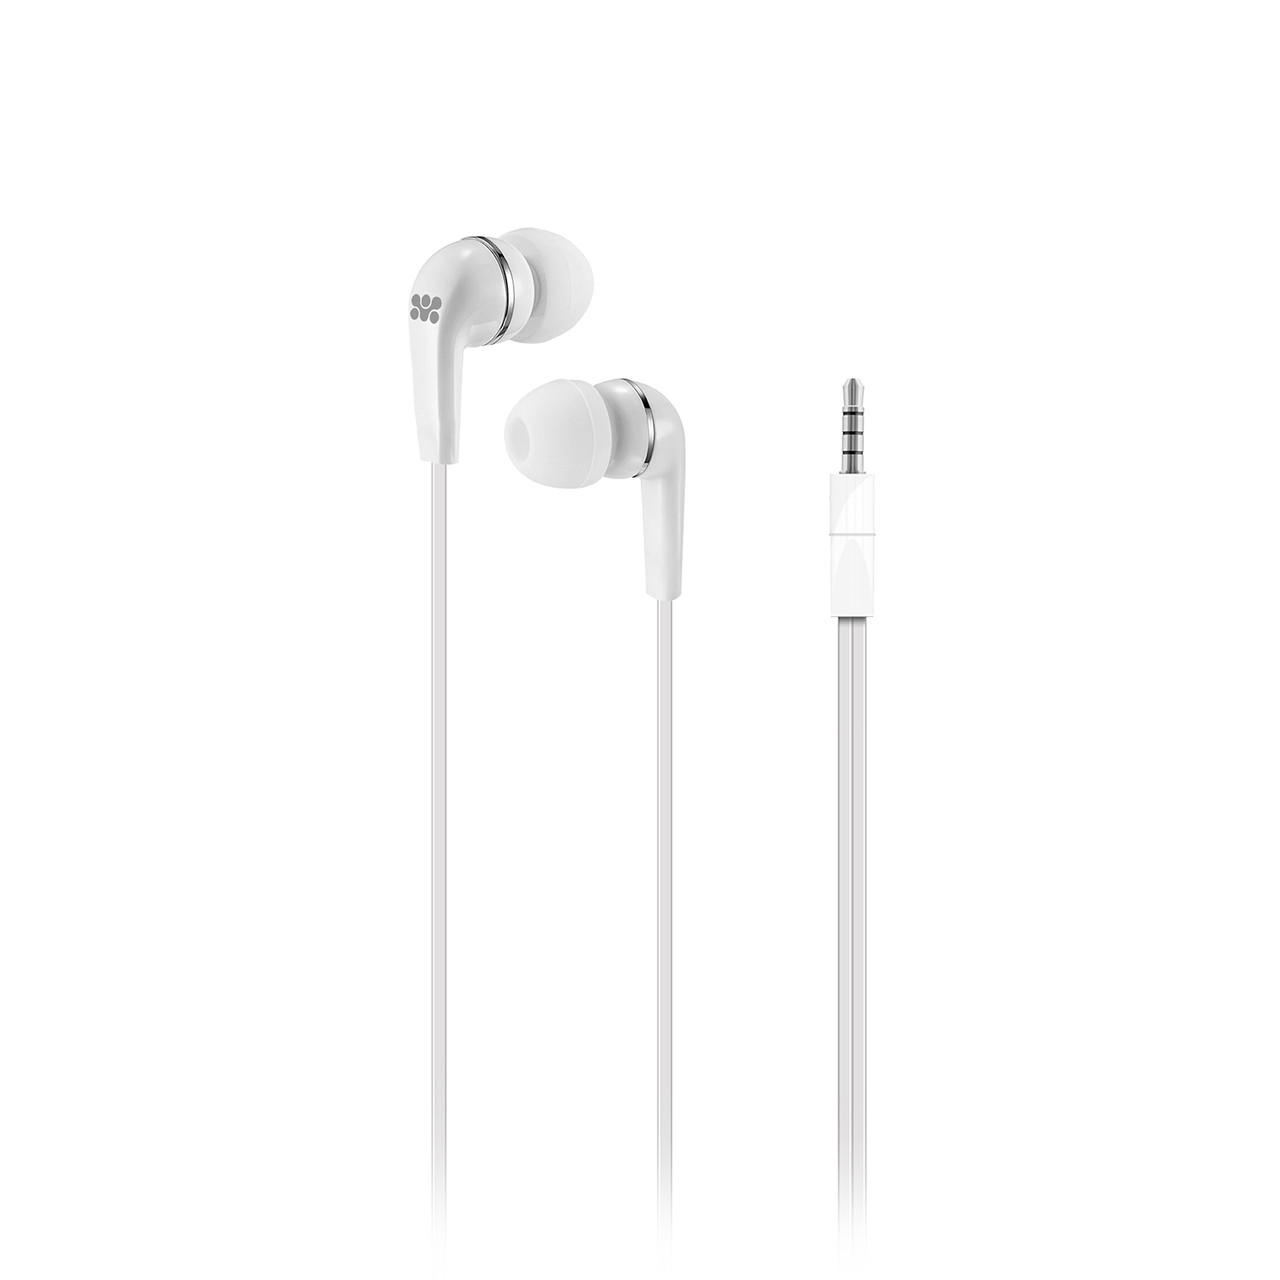 Проводные наушники Promate earMate-Uni1 White